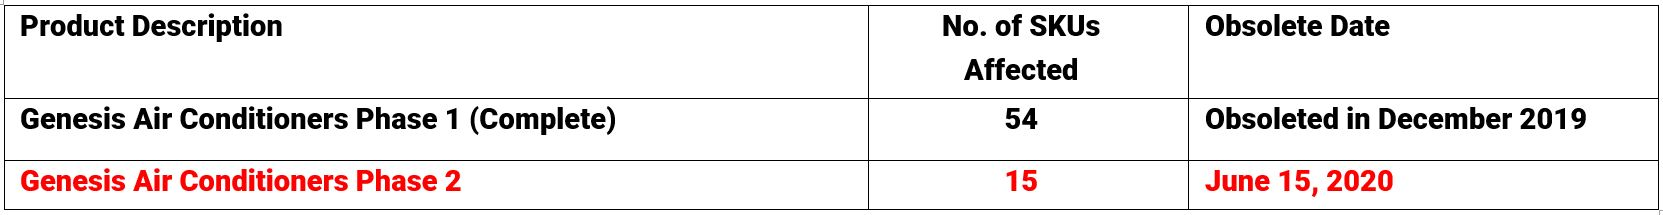 Calendario de obsolescencia de las unidades Génesis